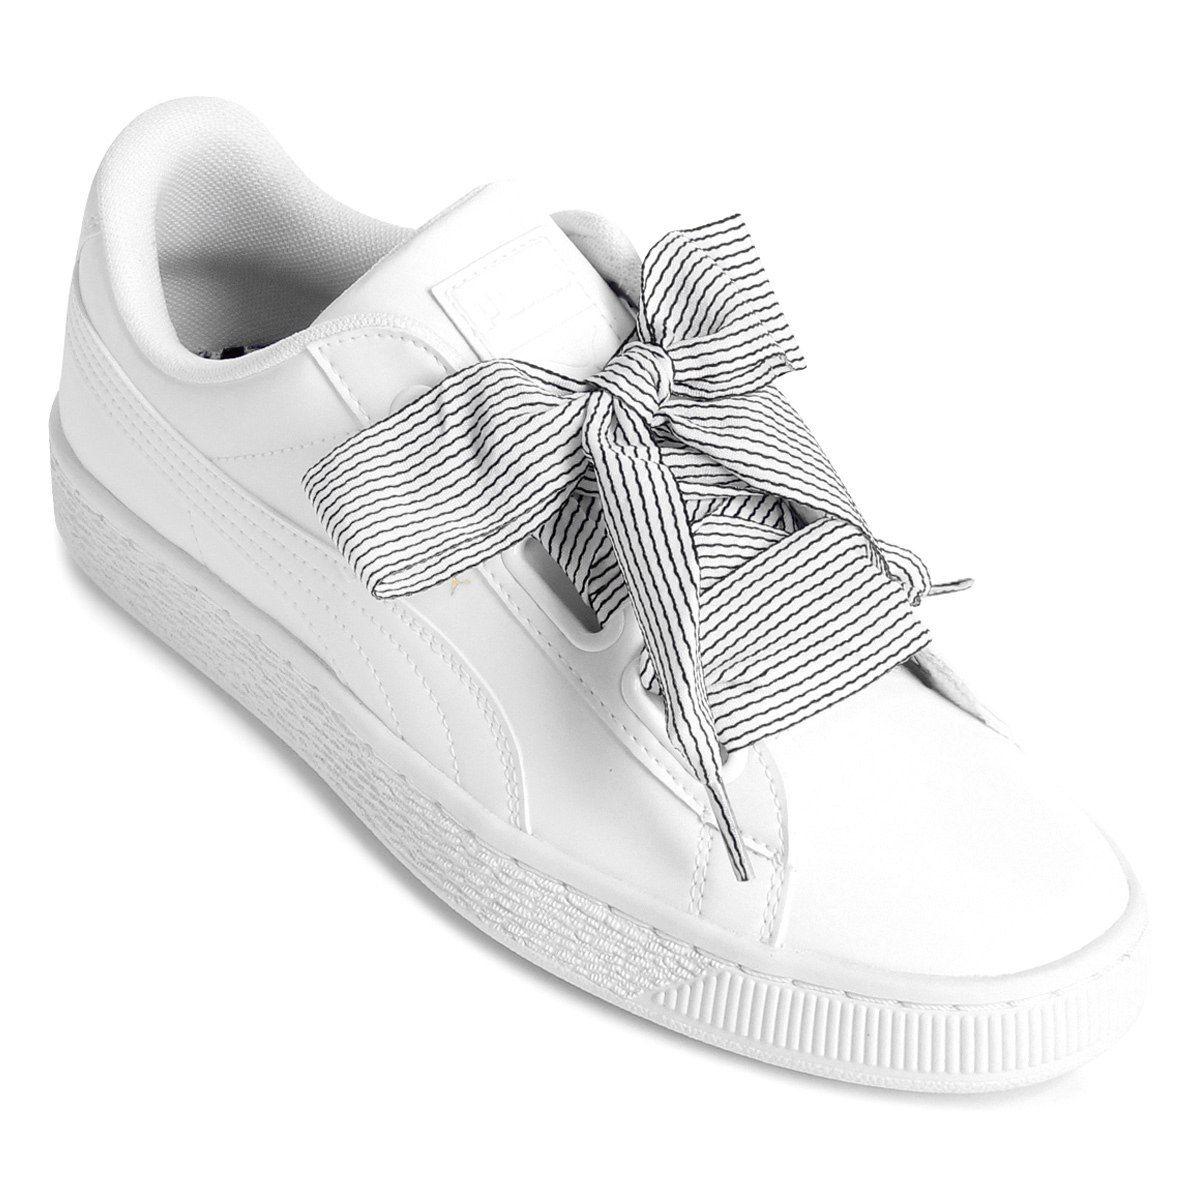 8904bafffd5 Tênis Puma Basket Heart Wn S Feminino - Branco